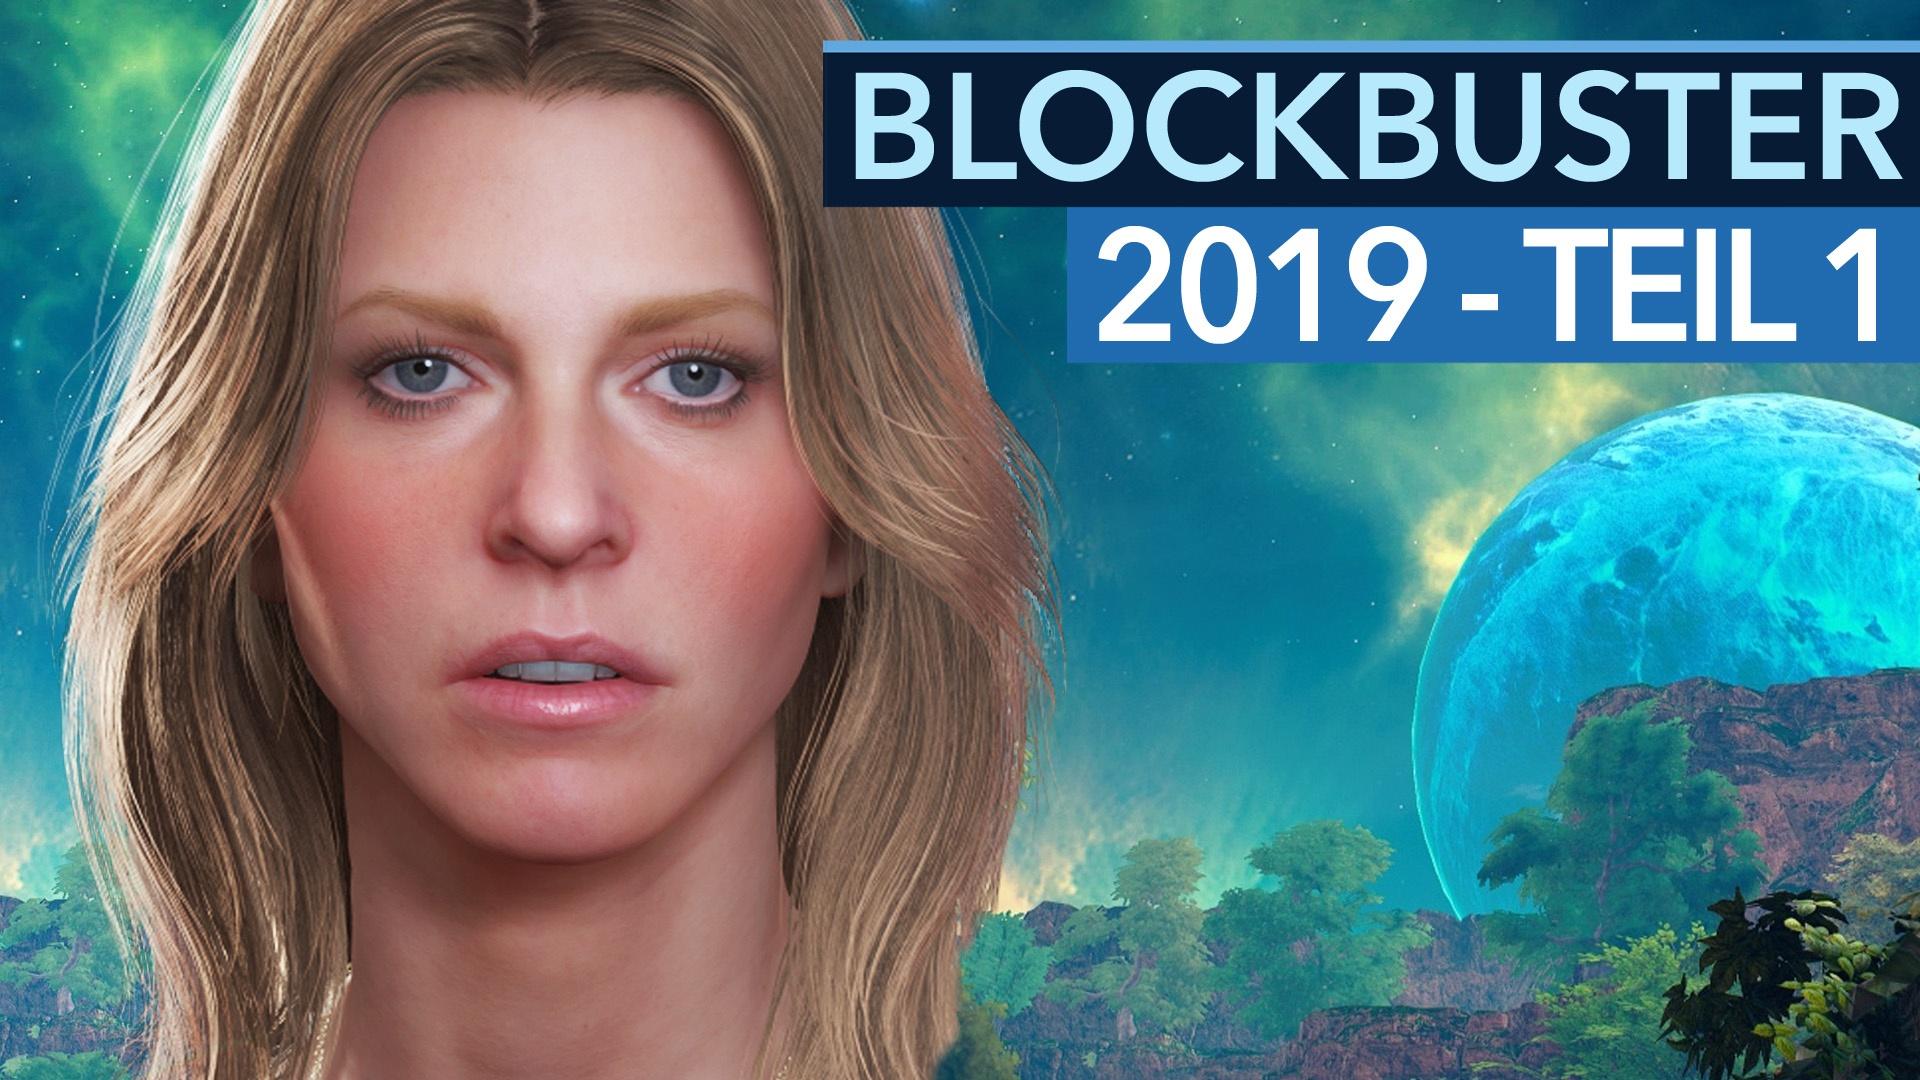 Blockbuster Spiel